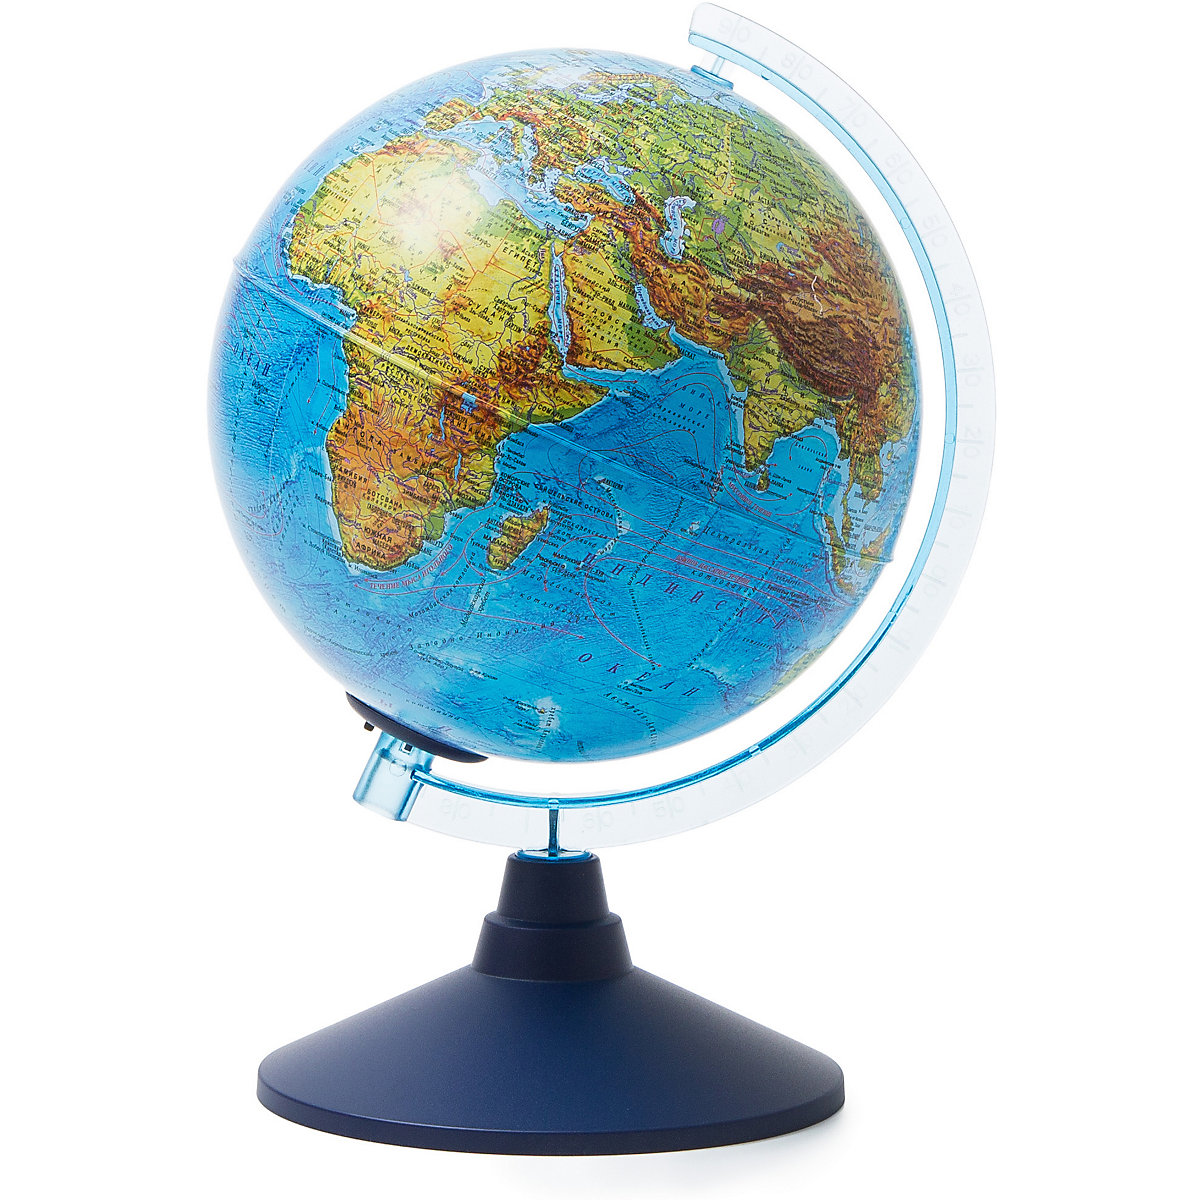 GLOBEN Desk Set 8075093 Globe Accessories Organizer For Office And School Schools Offices MTpromo